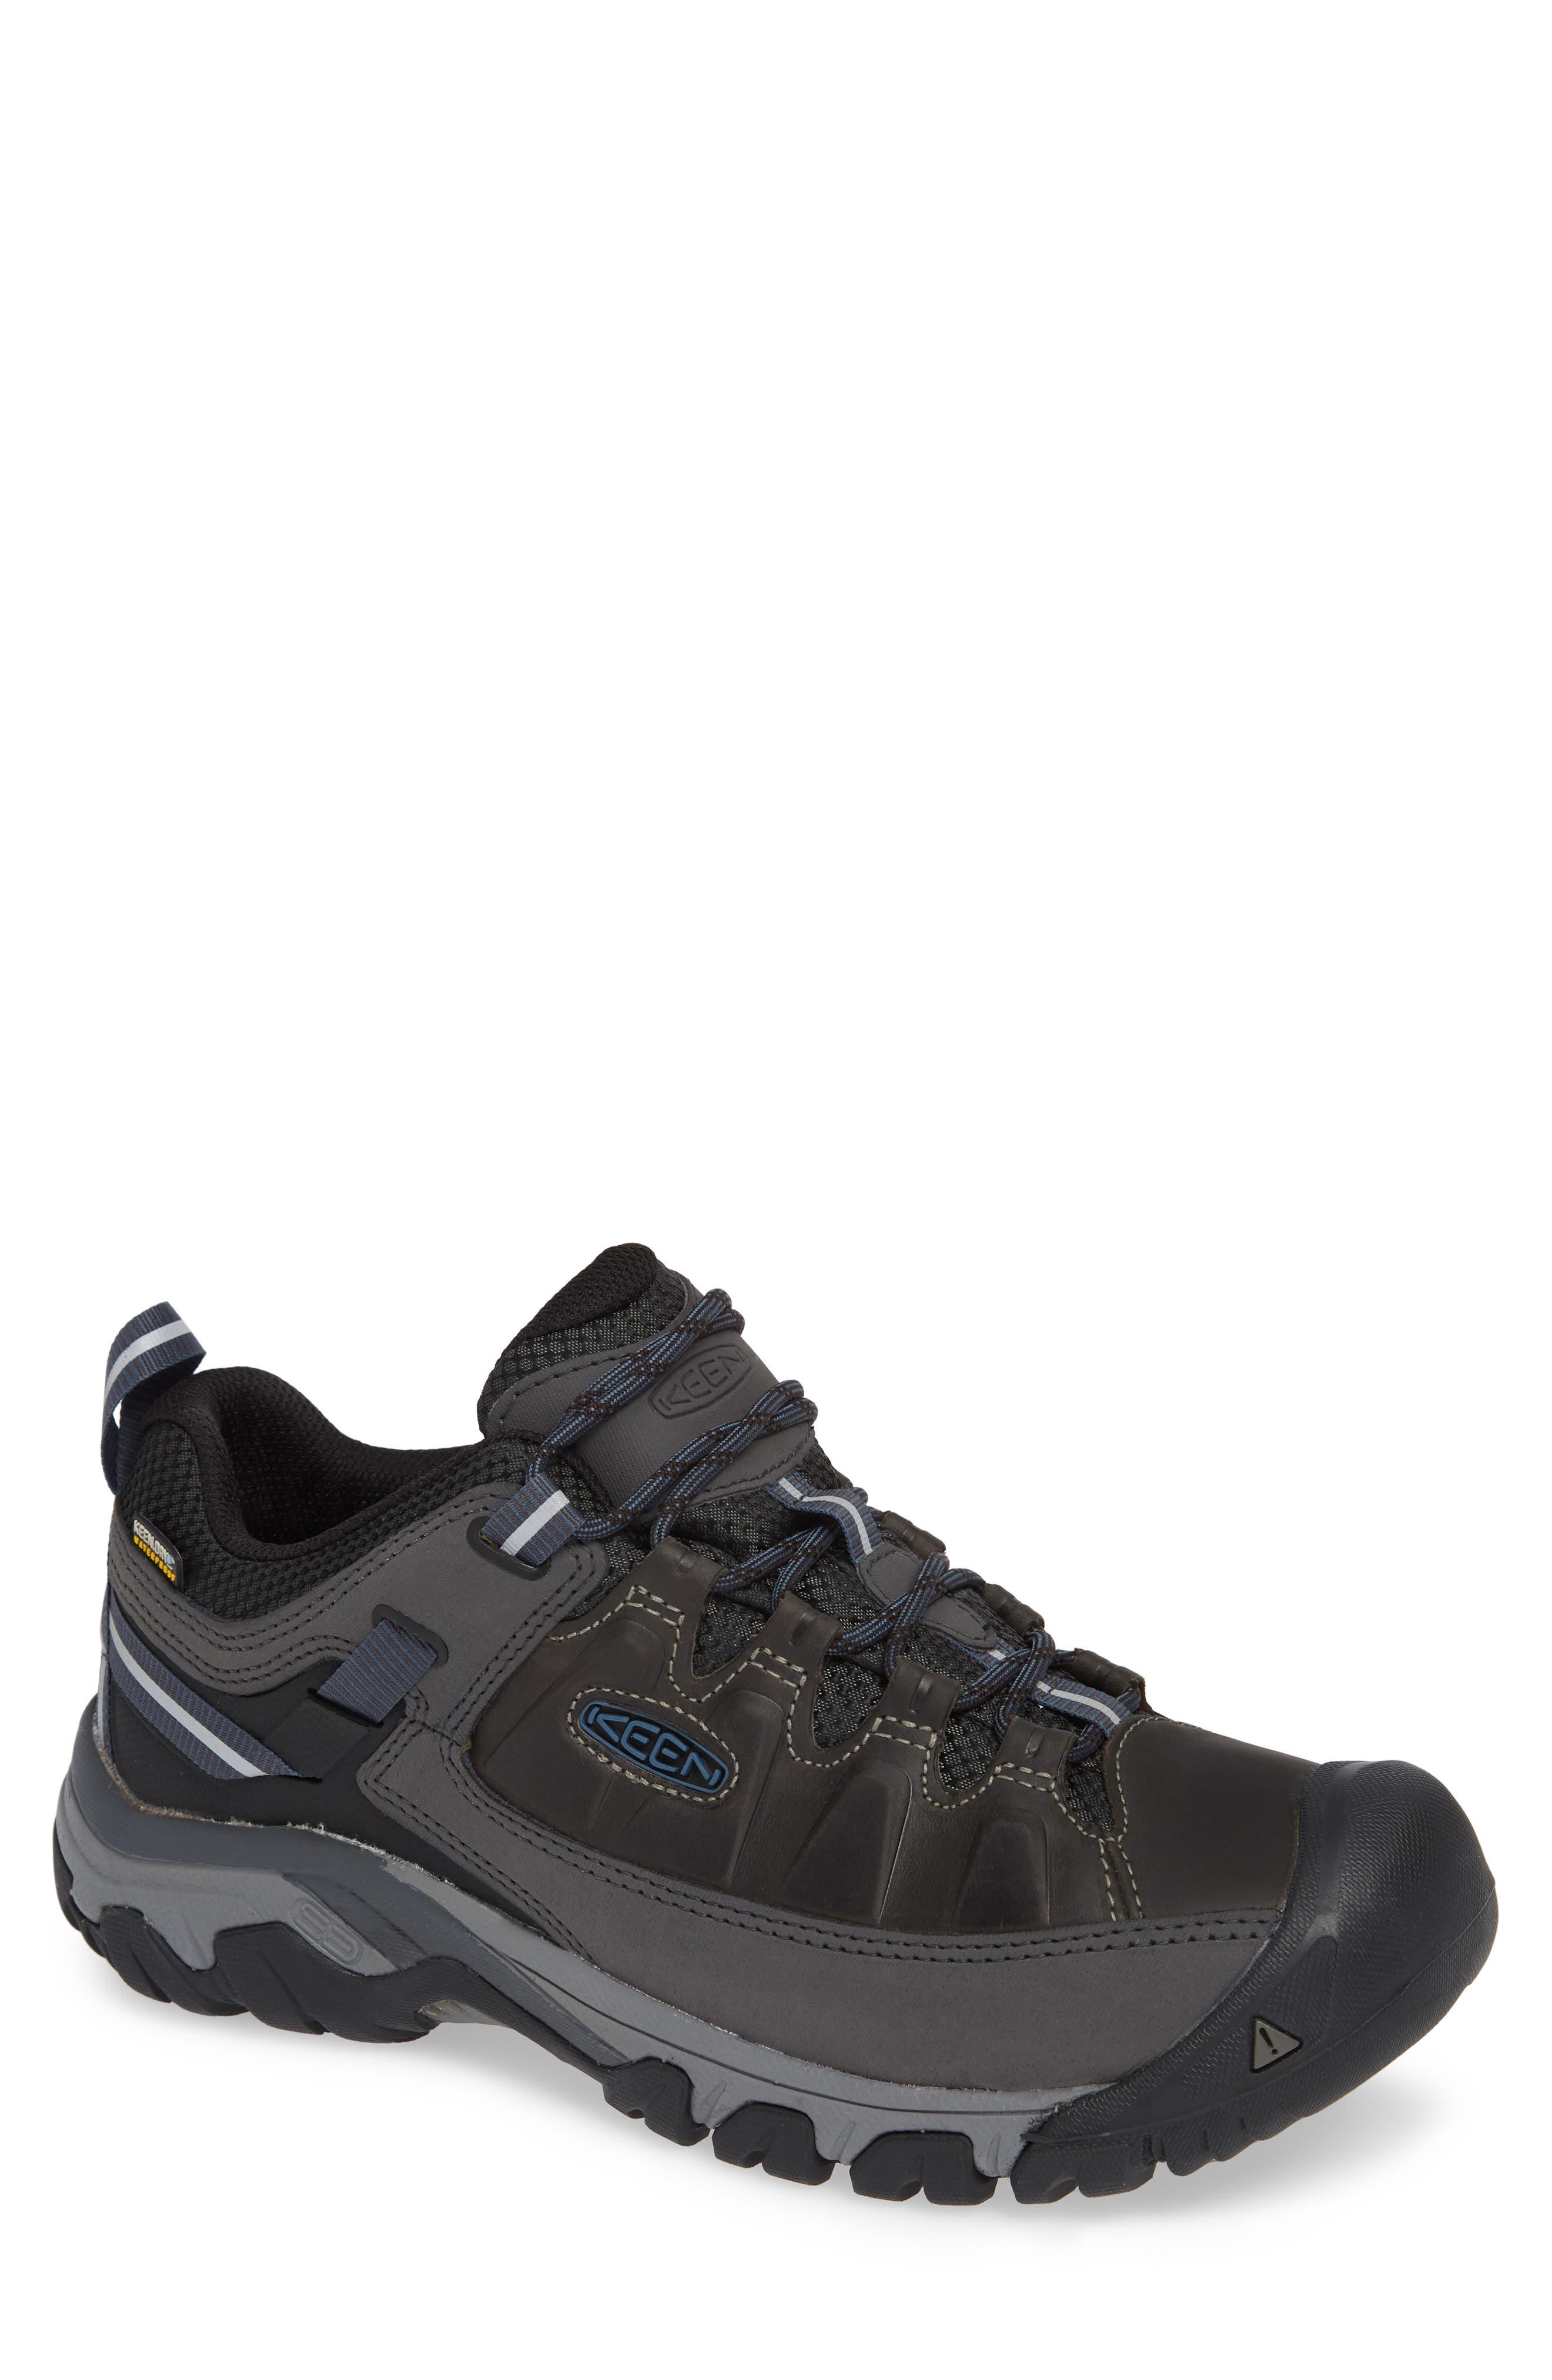 Targhee III Waterproof Hiking Shoe,                             Main thumbnail 1, color,                             STEEL GREY/ CAPTAINS BLUE